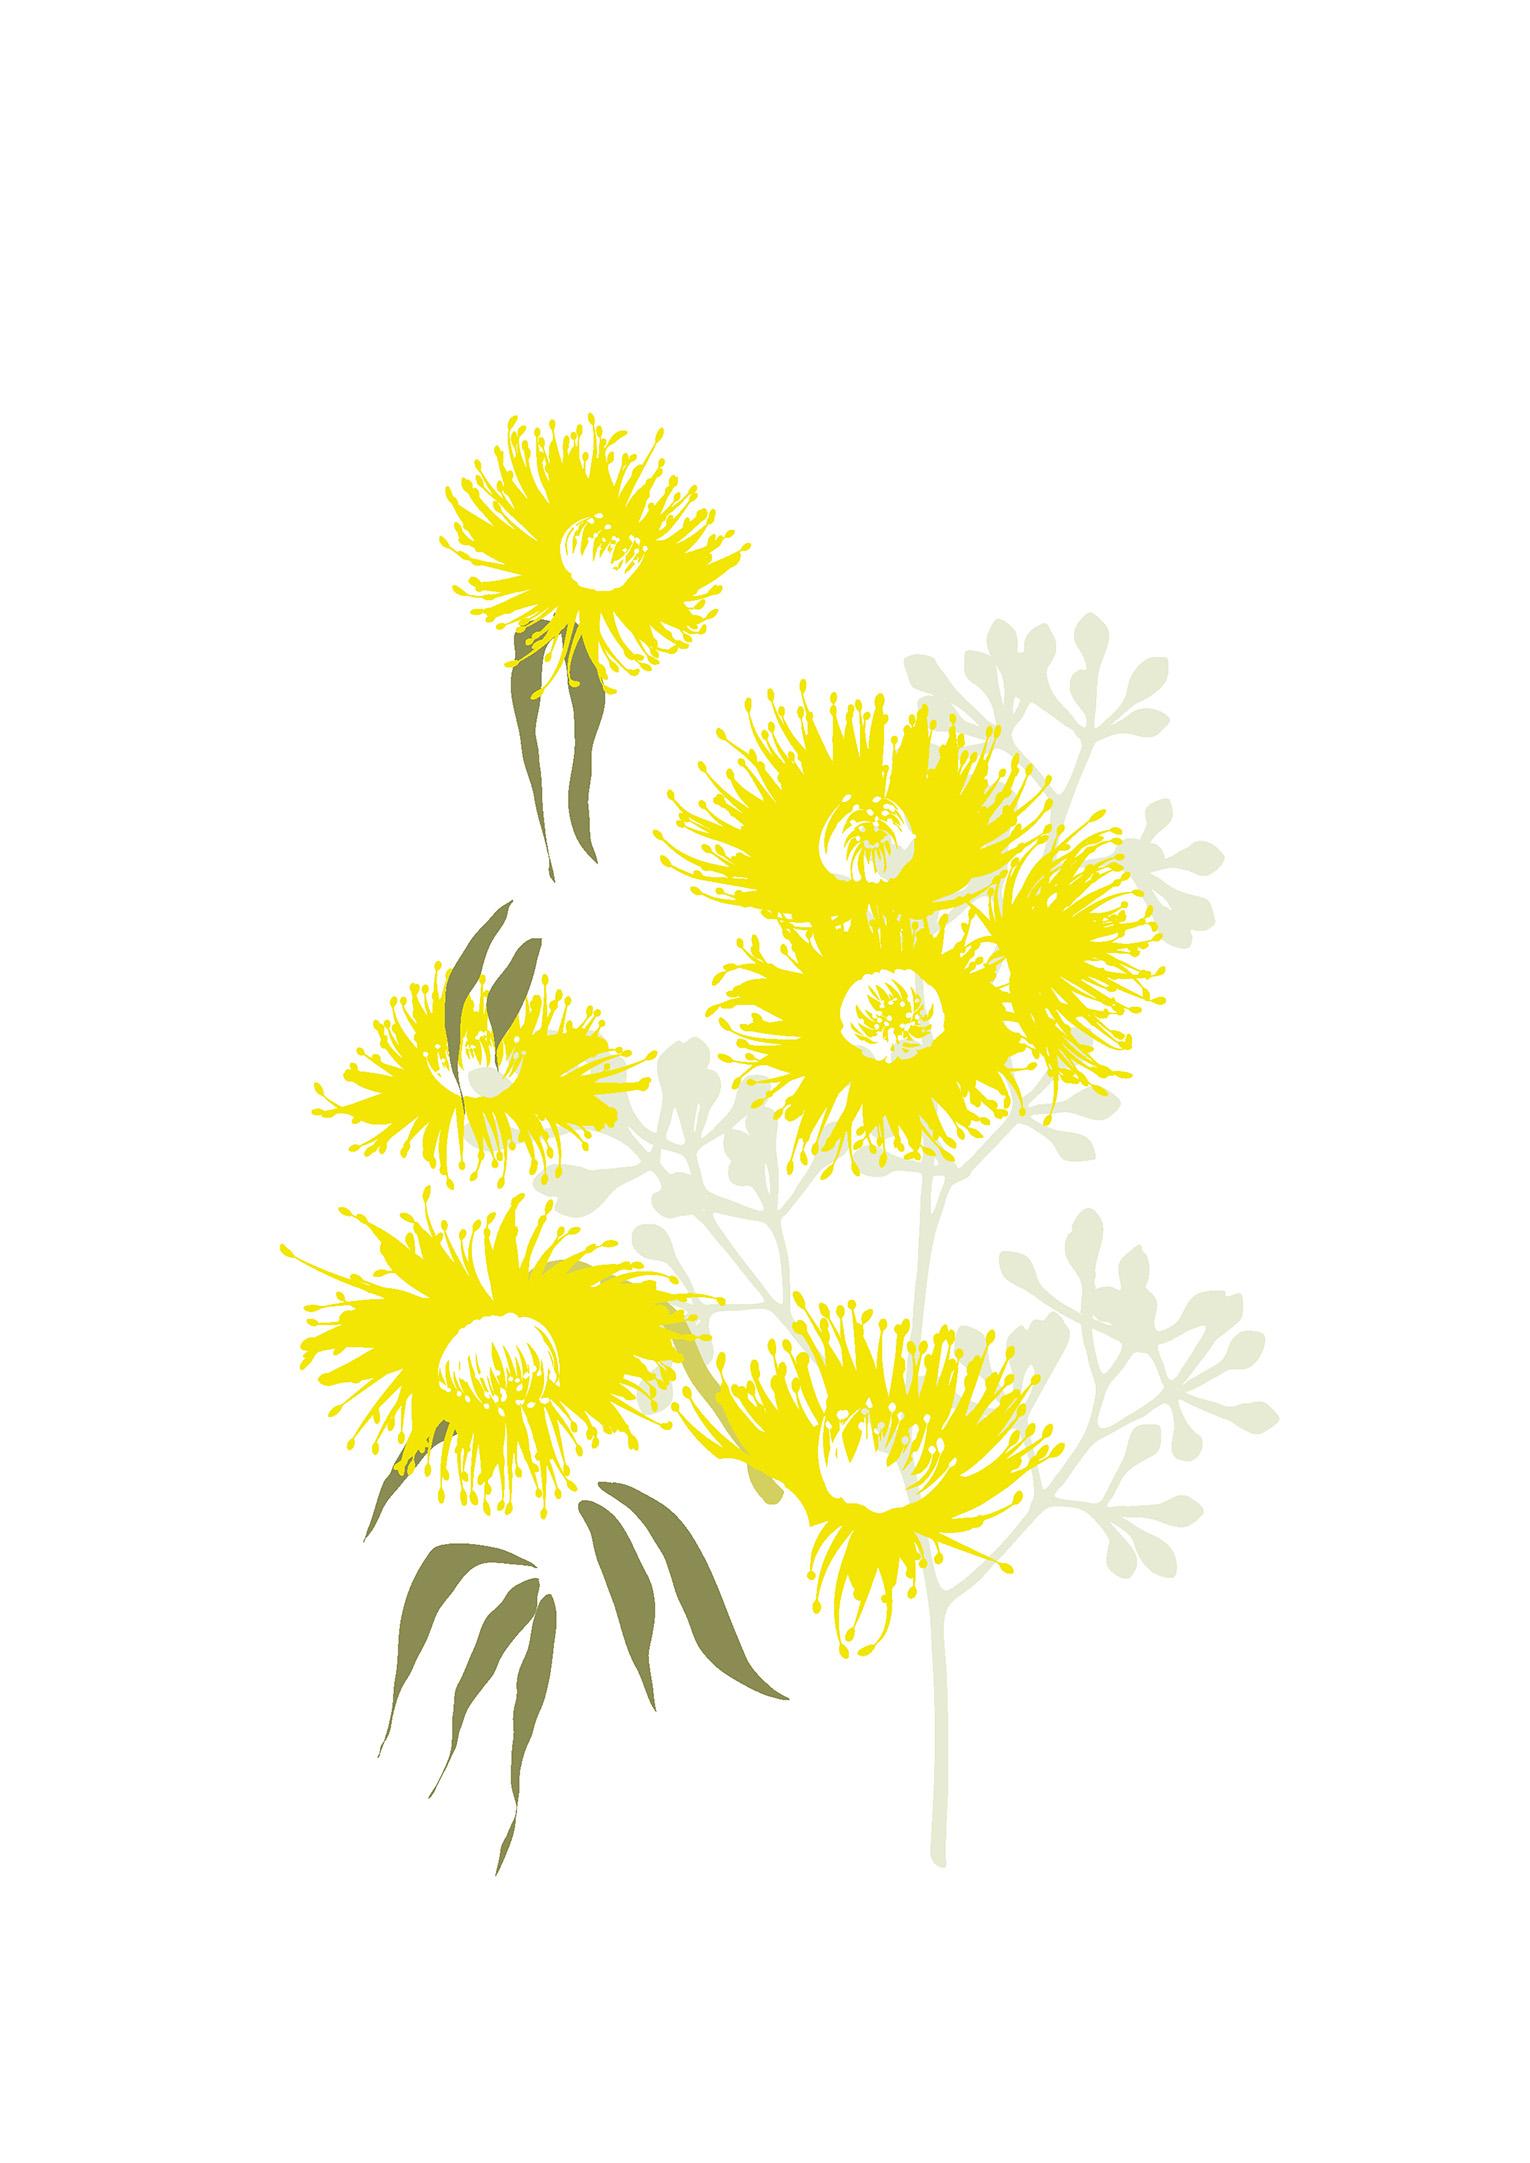 australian-flowers-illustration-01